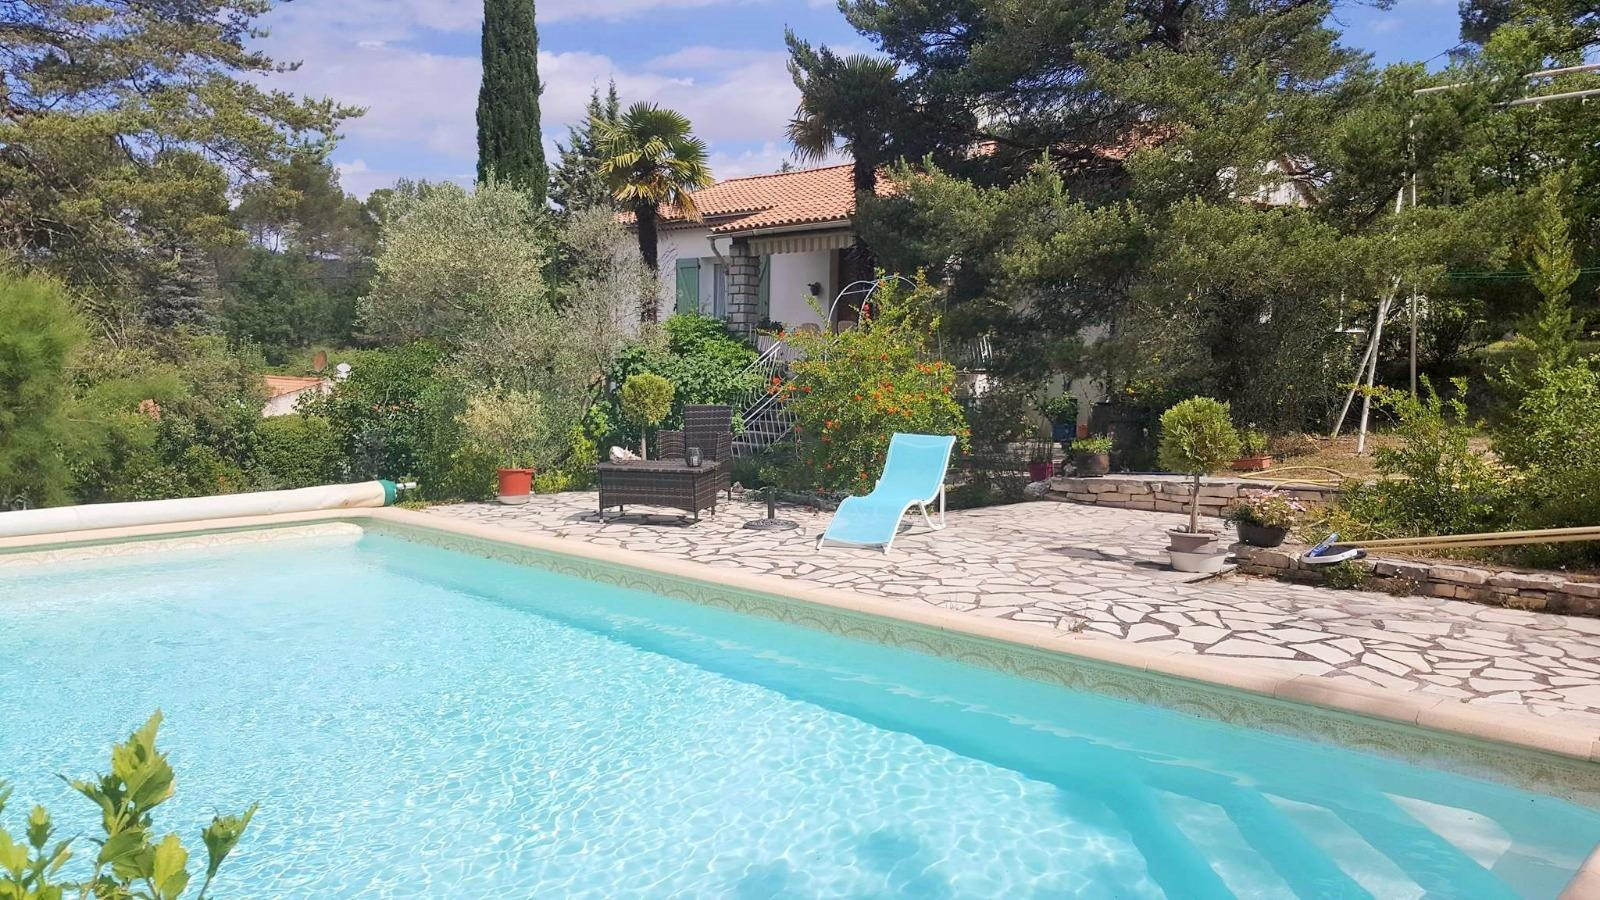 Location de vacances Villa Pierrevert 04860